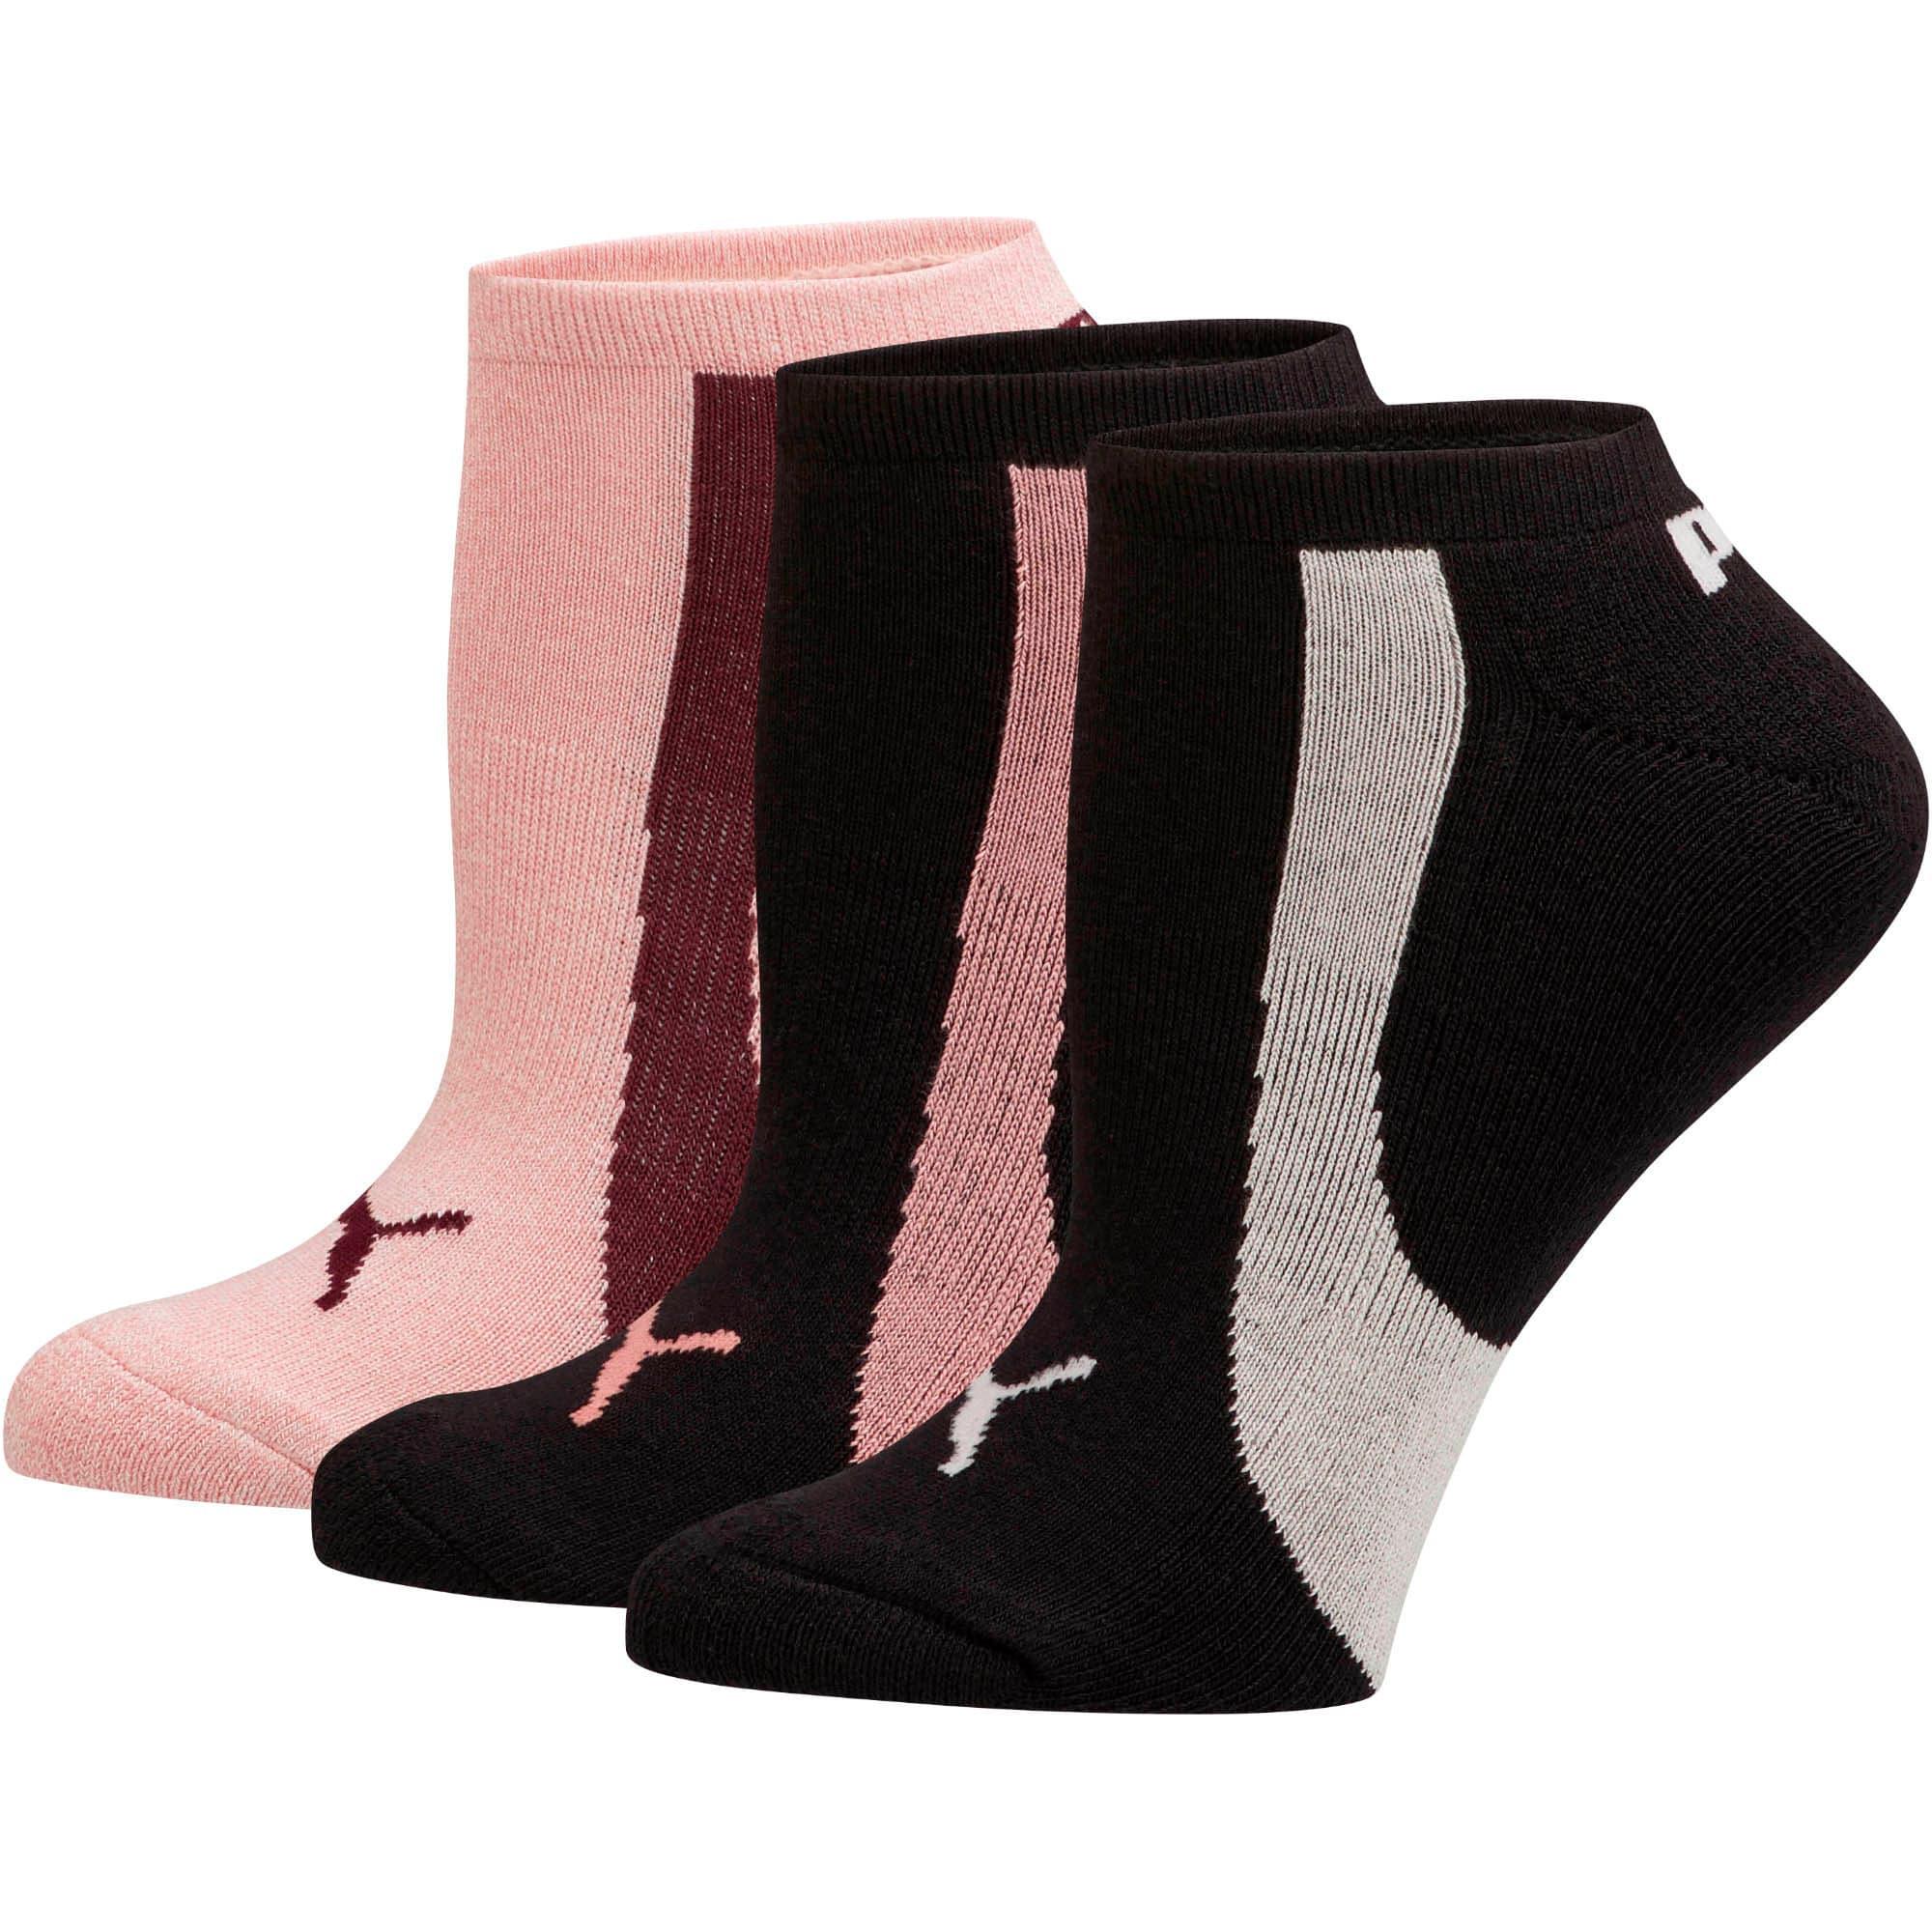 Thumbnail 1 of Women's No Show Socks [3 Pack], PSTL COMBO, medium